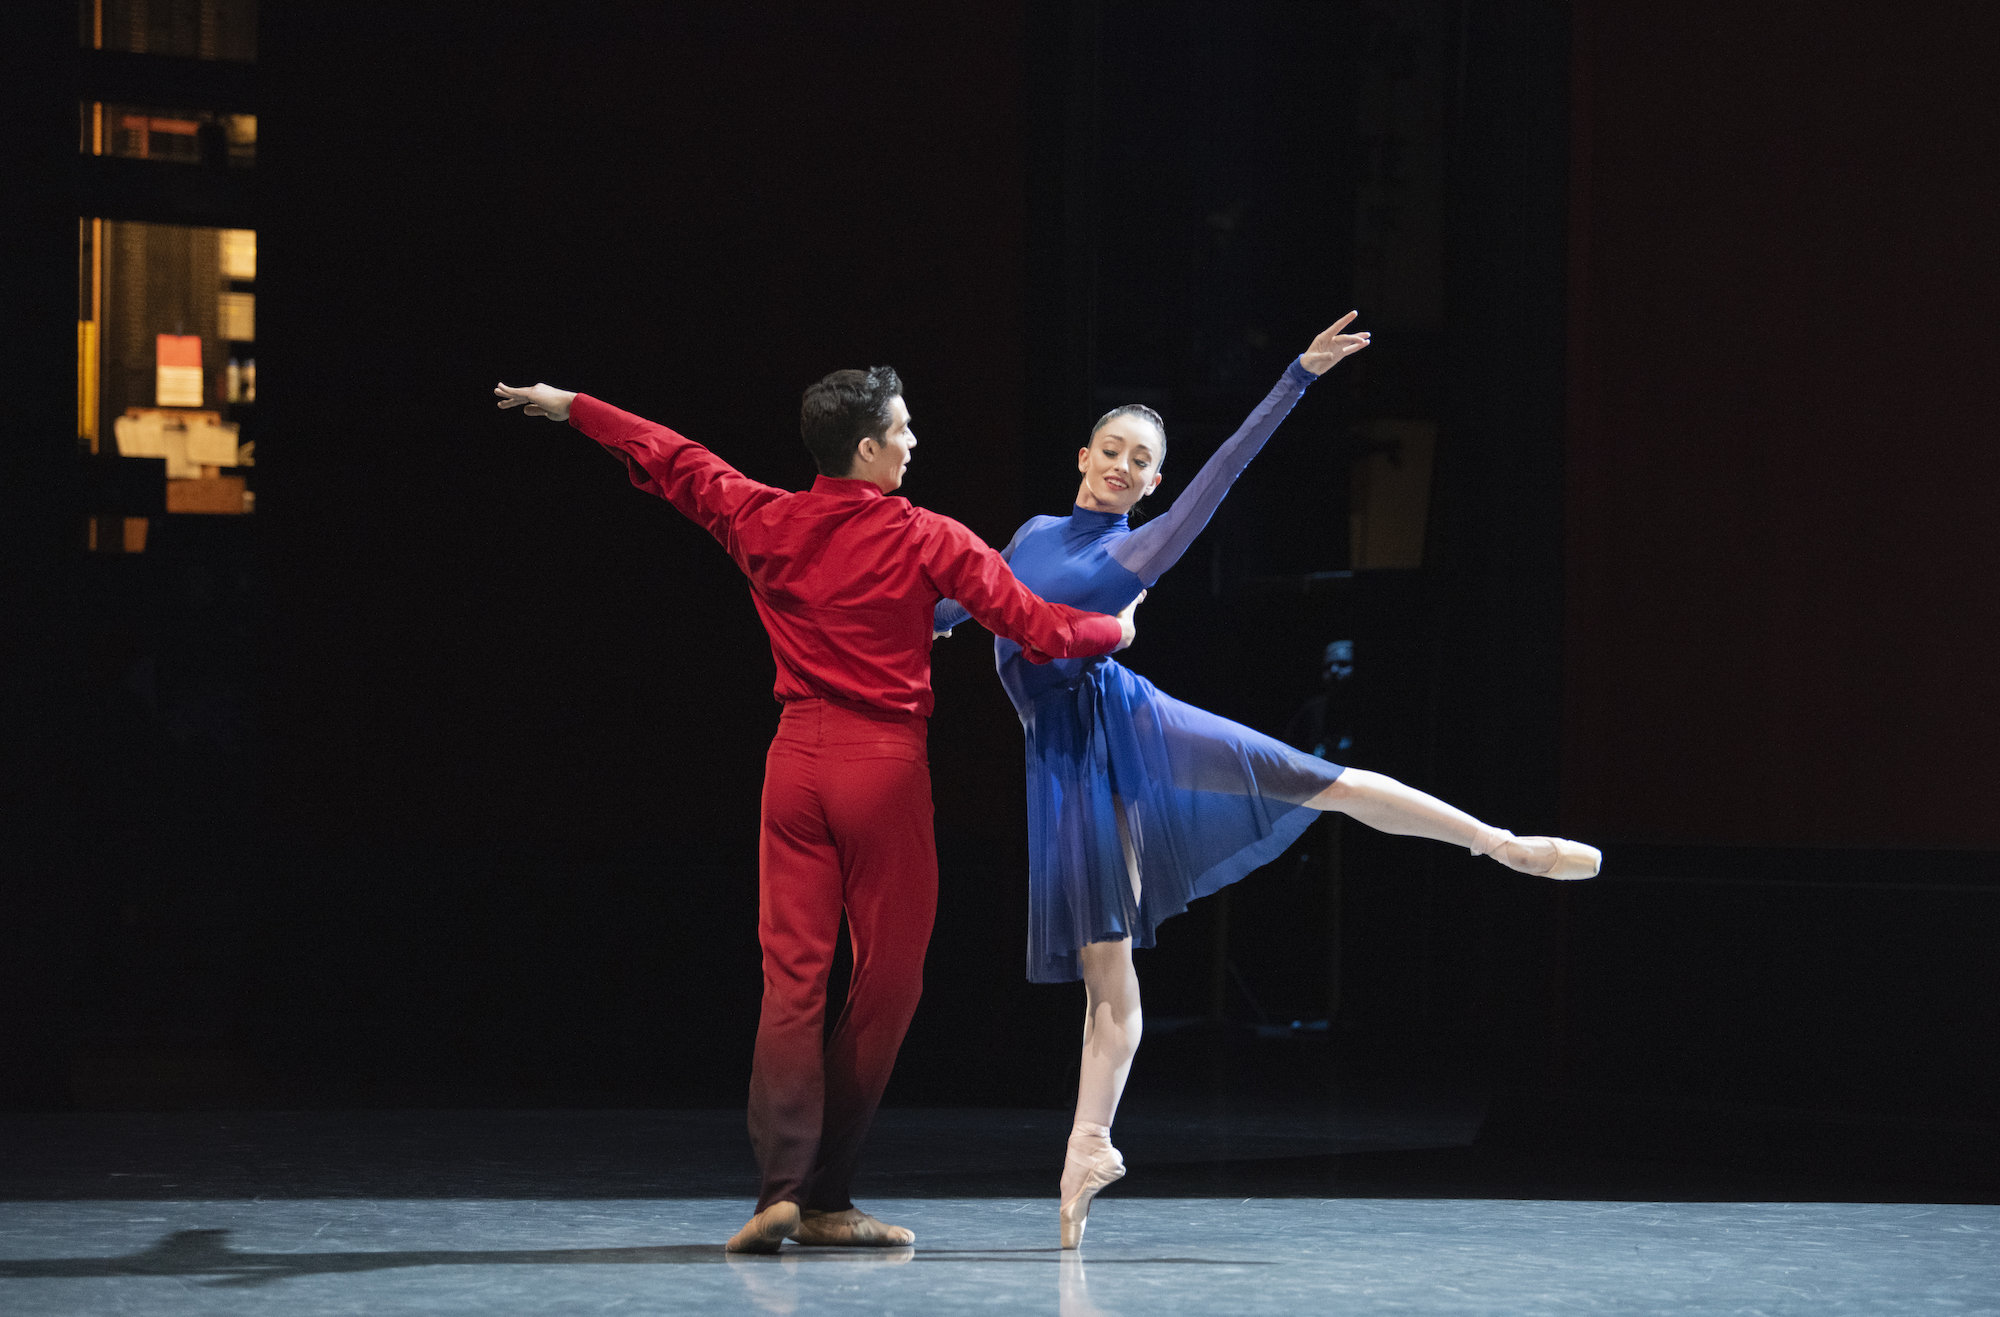 Madison Keesler and Steven Morse in Millepied's Appassionata. (© Erik Tomasson)